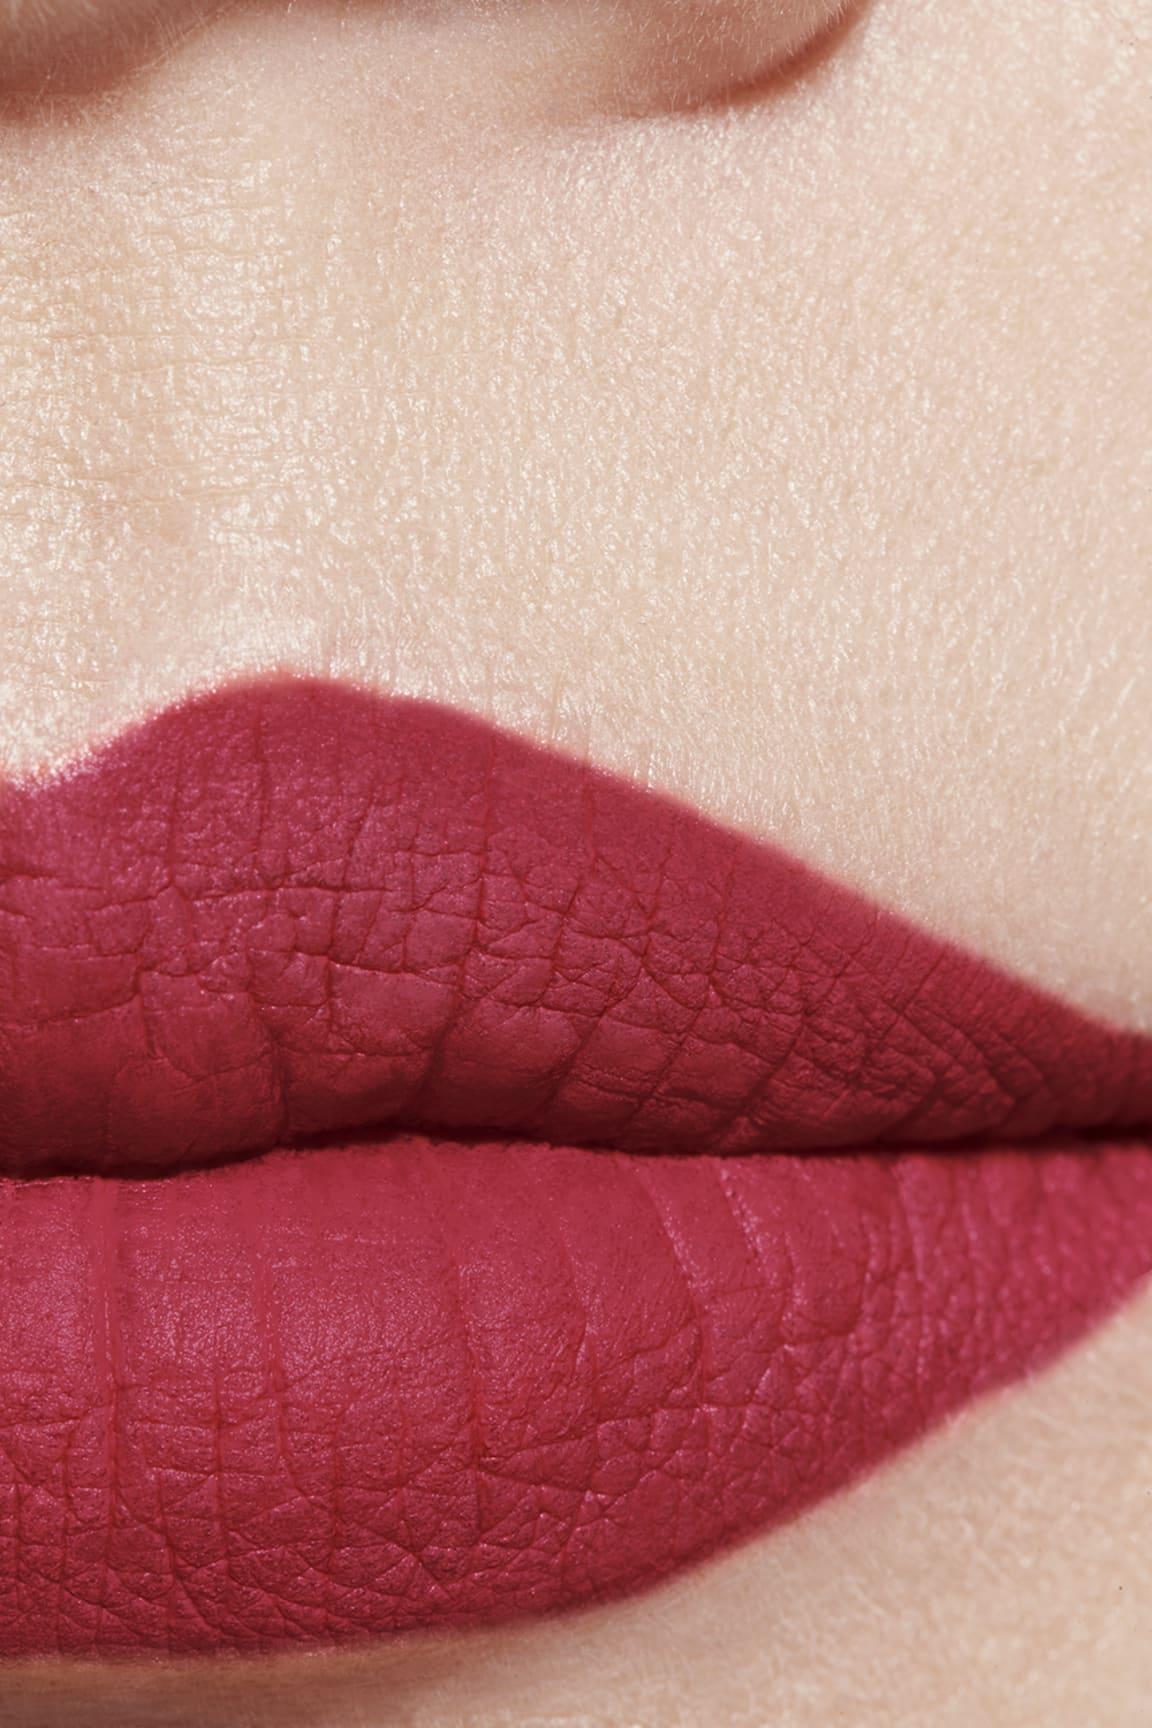 Application makeup visual 1 - ROUGE ALLURE VELVET EXTRÊME 114 - ÉPITOME